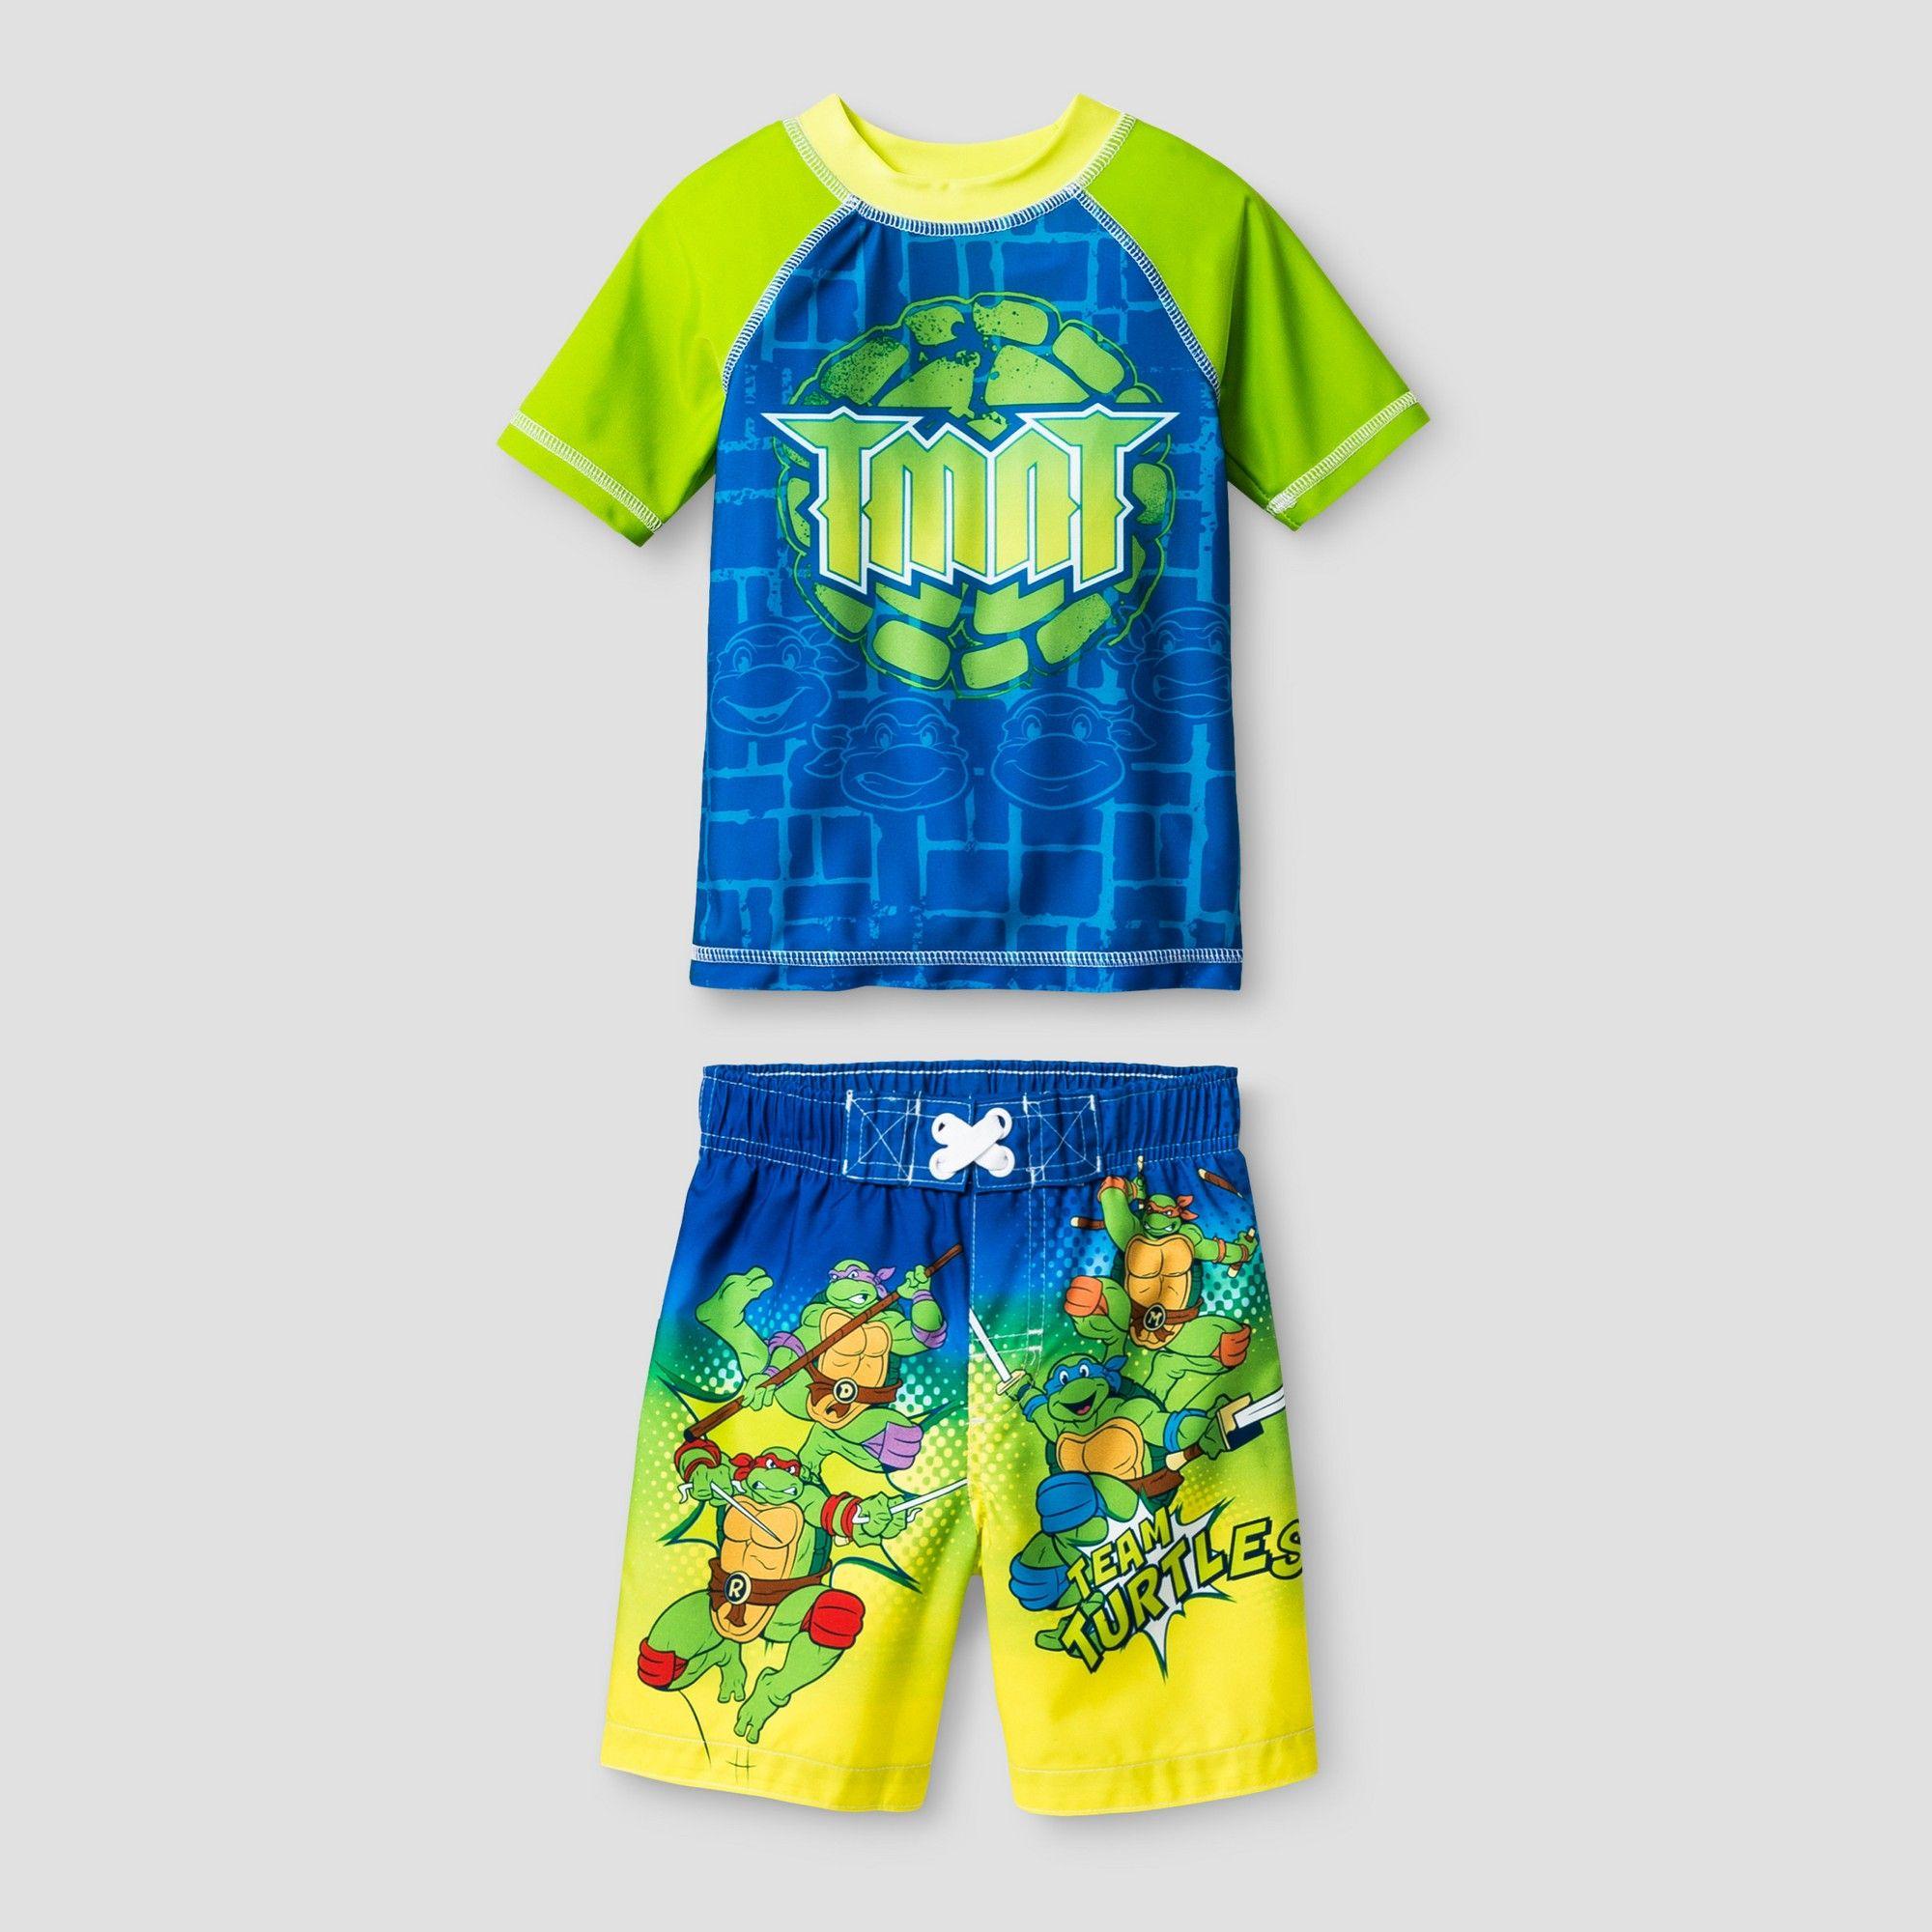 0b11c14f32 Teenage Mutant Ninja Turtles Toddler Boys' Swim Trunks - Blue 2T, Green